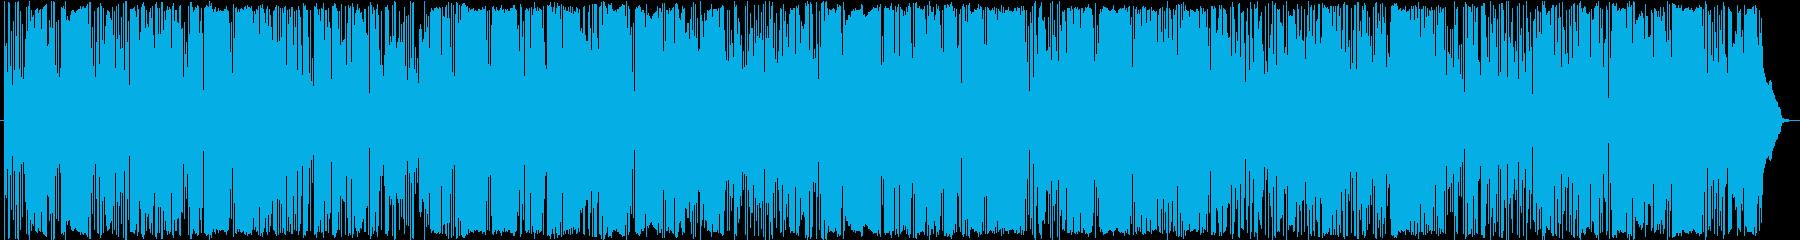 Trumpet Norinori Summer Latin Salsa's reproduced waveform